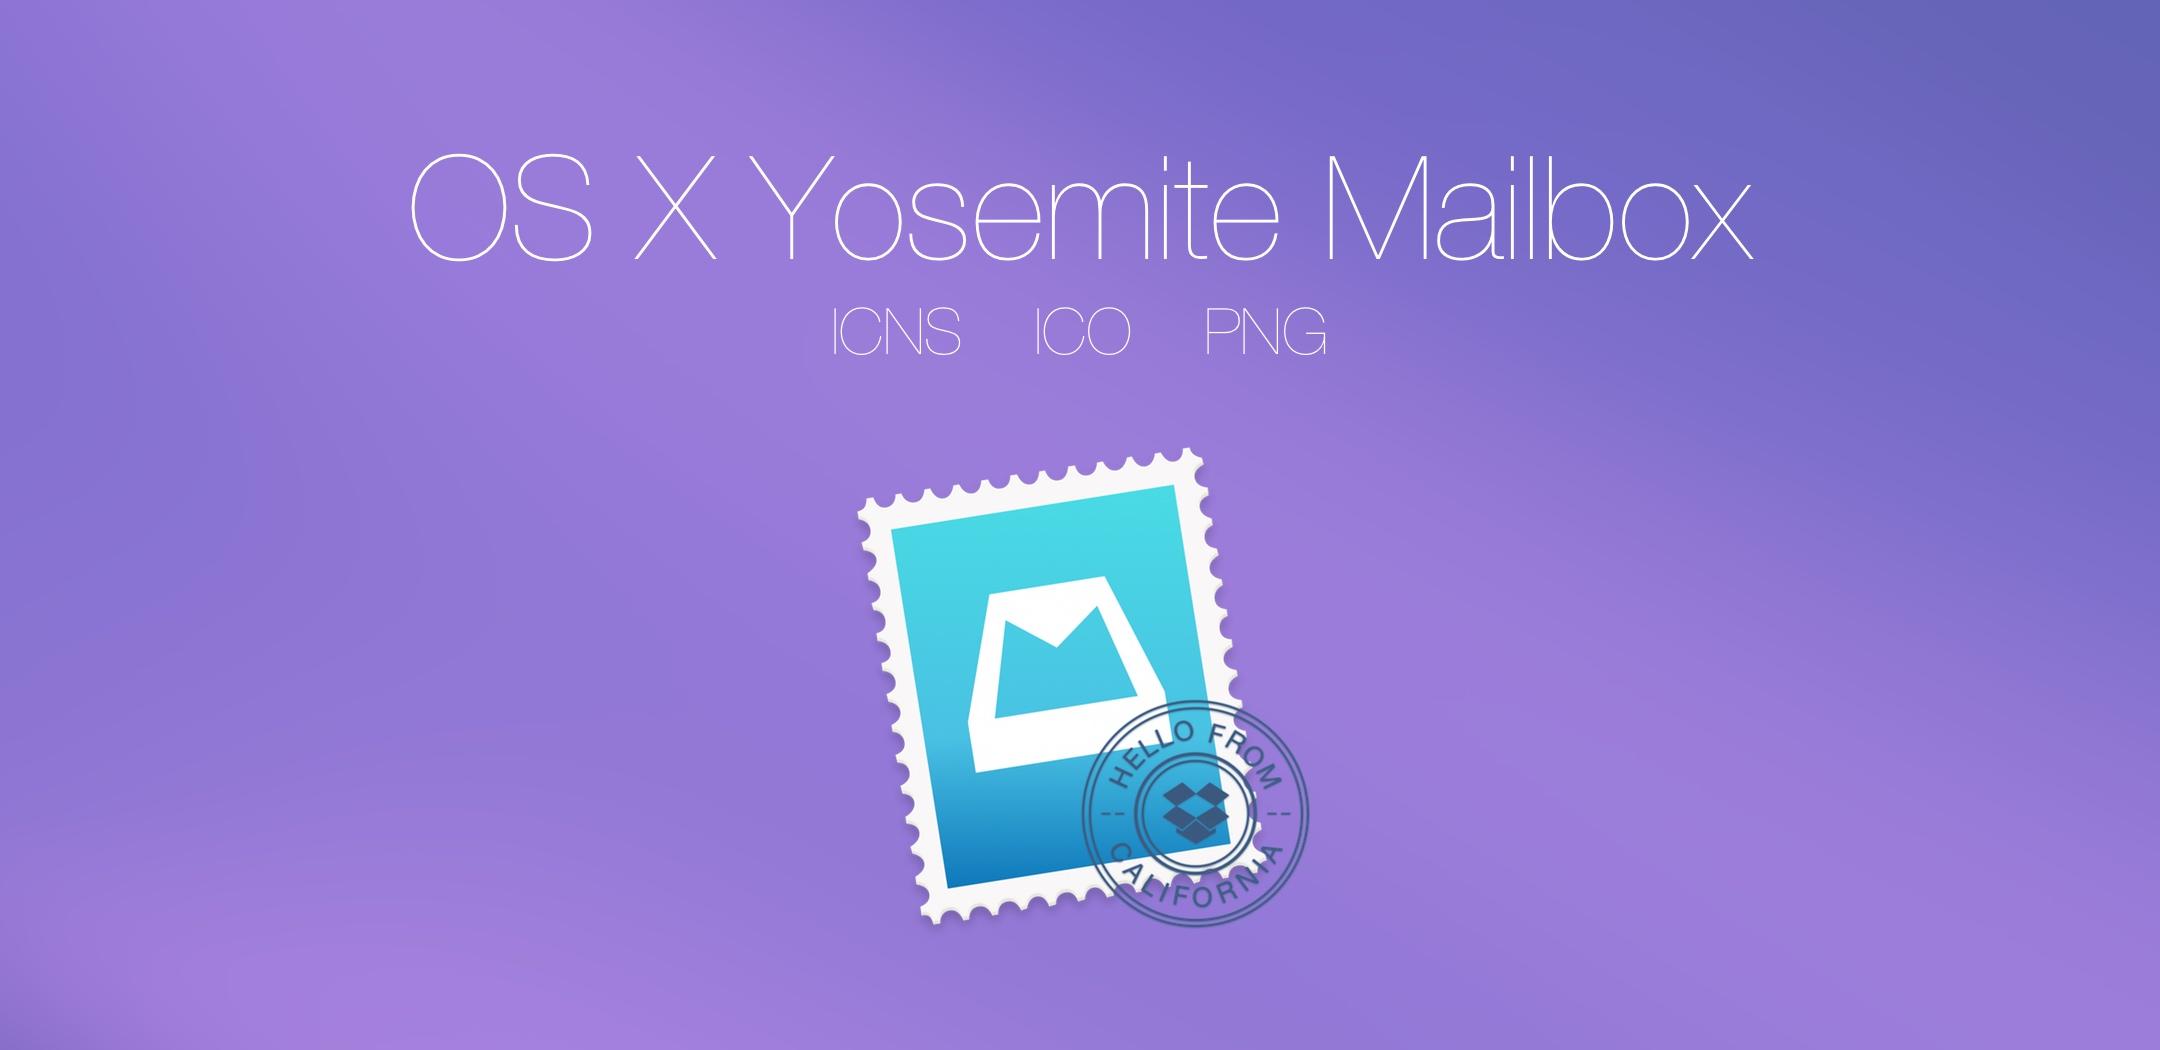 OS X Yosemite Mailbox